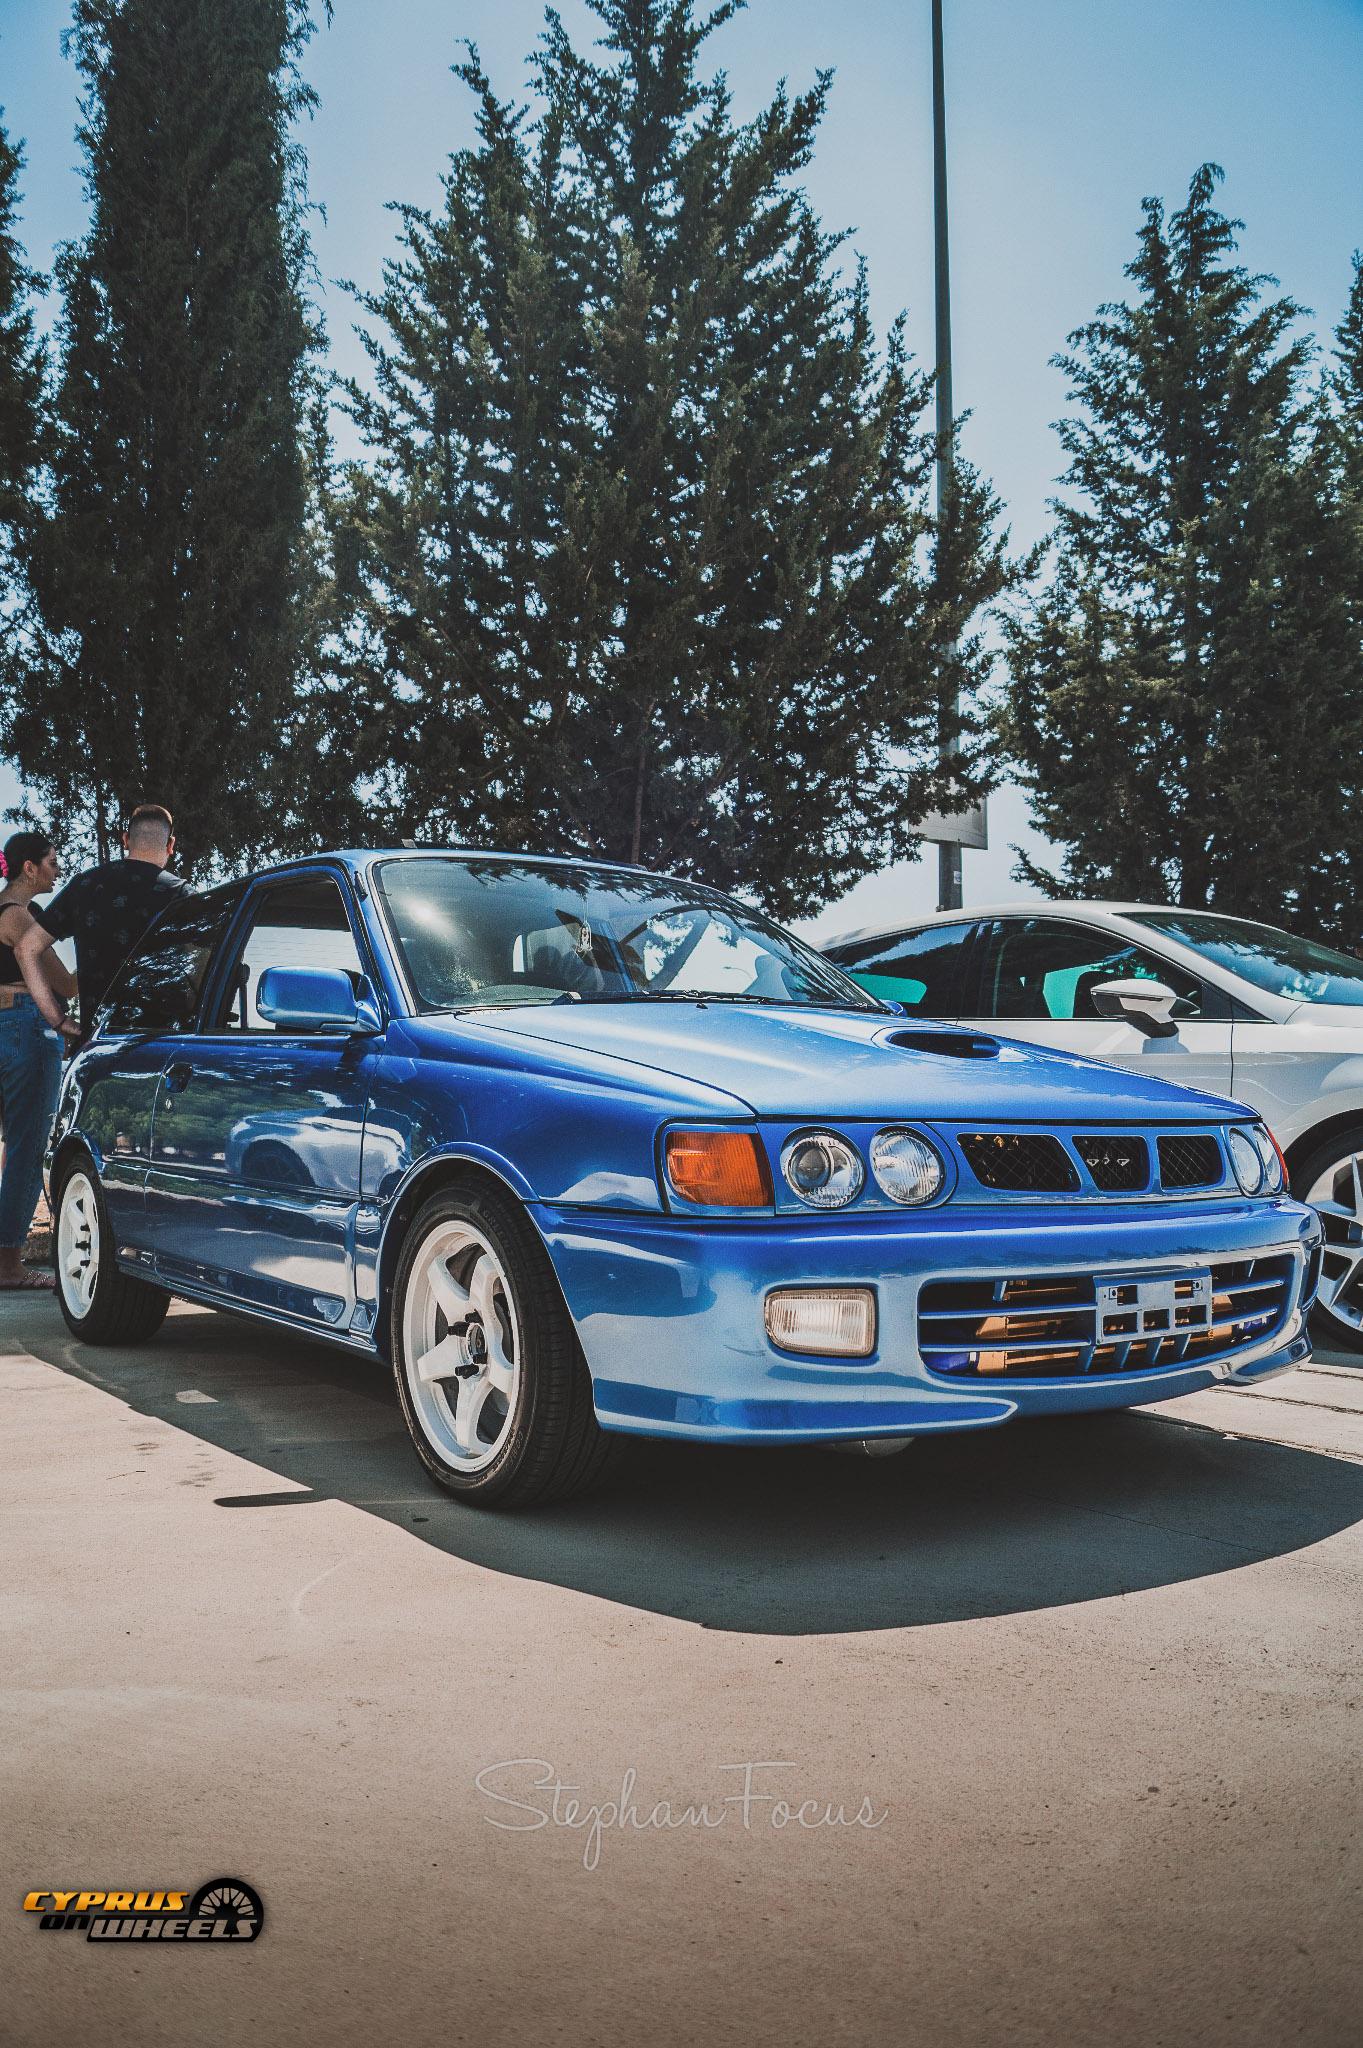 toyota starlet turbo modified